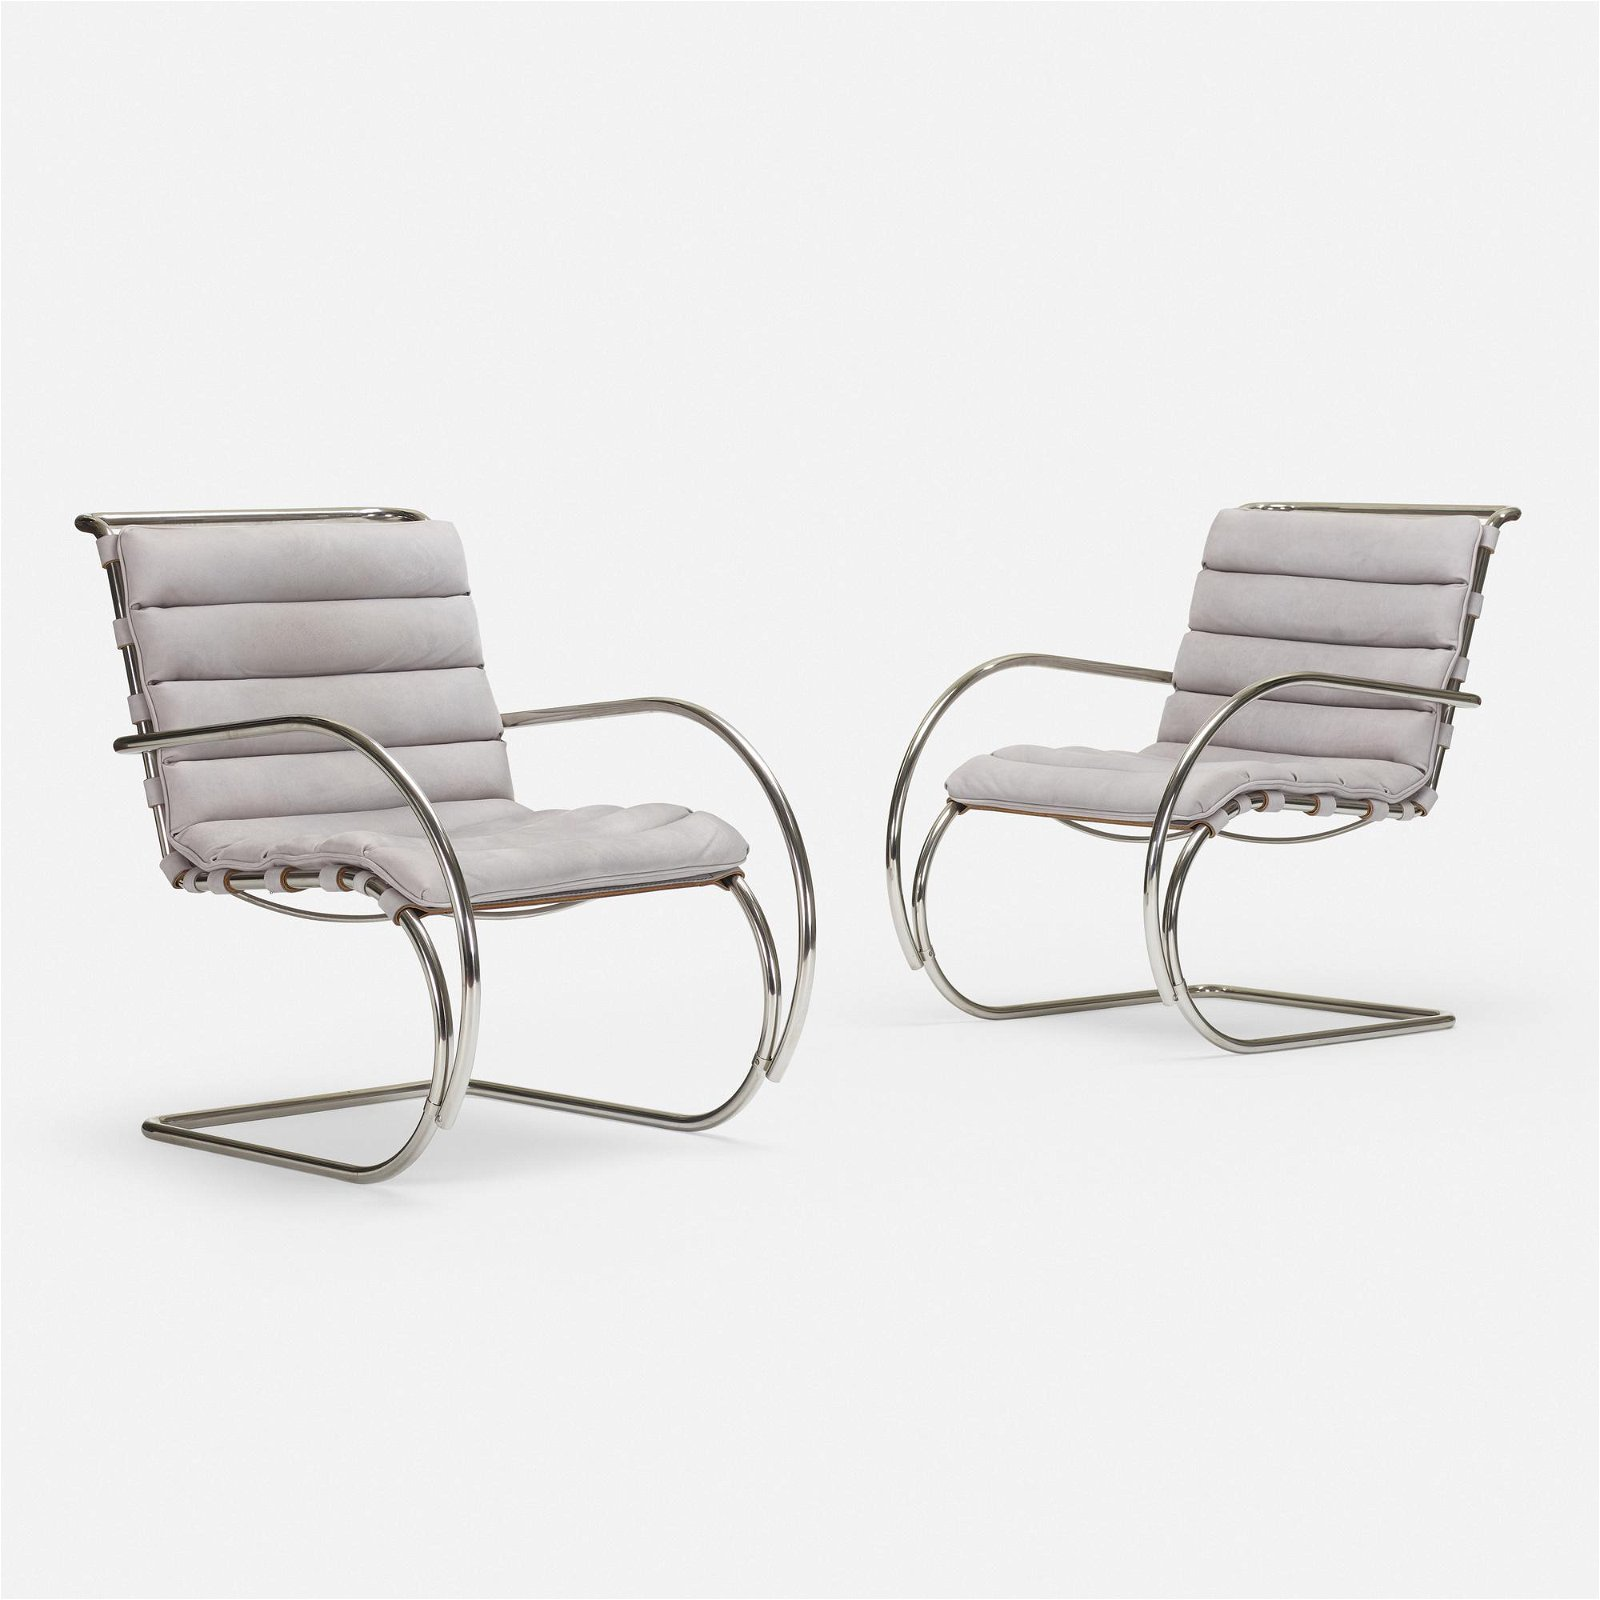 Ludwig Mies van der Rohe, MR lounge chairs, pair